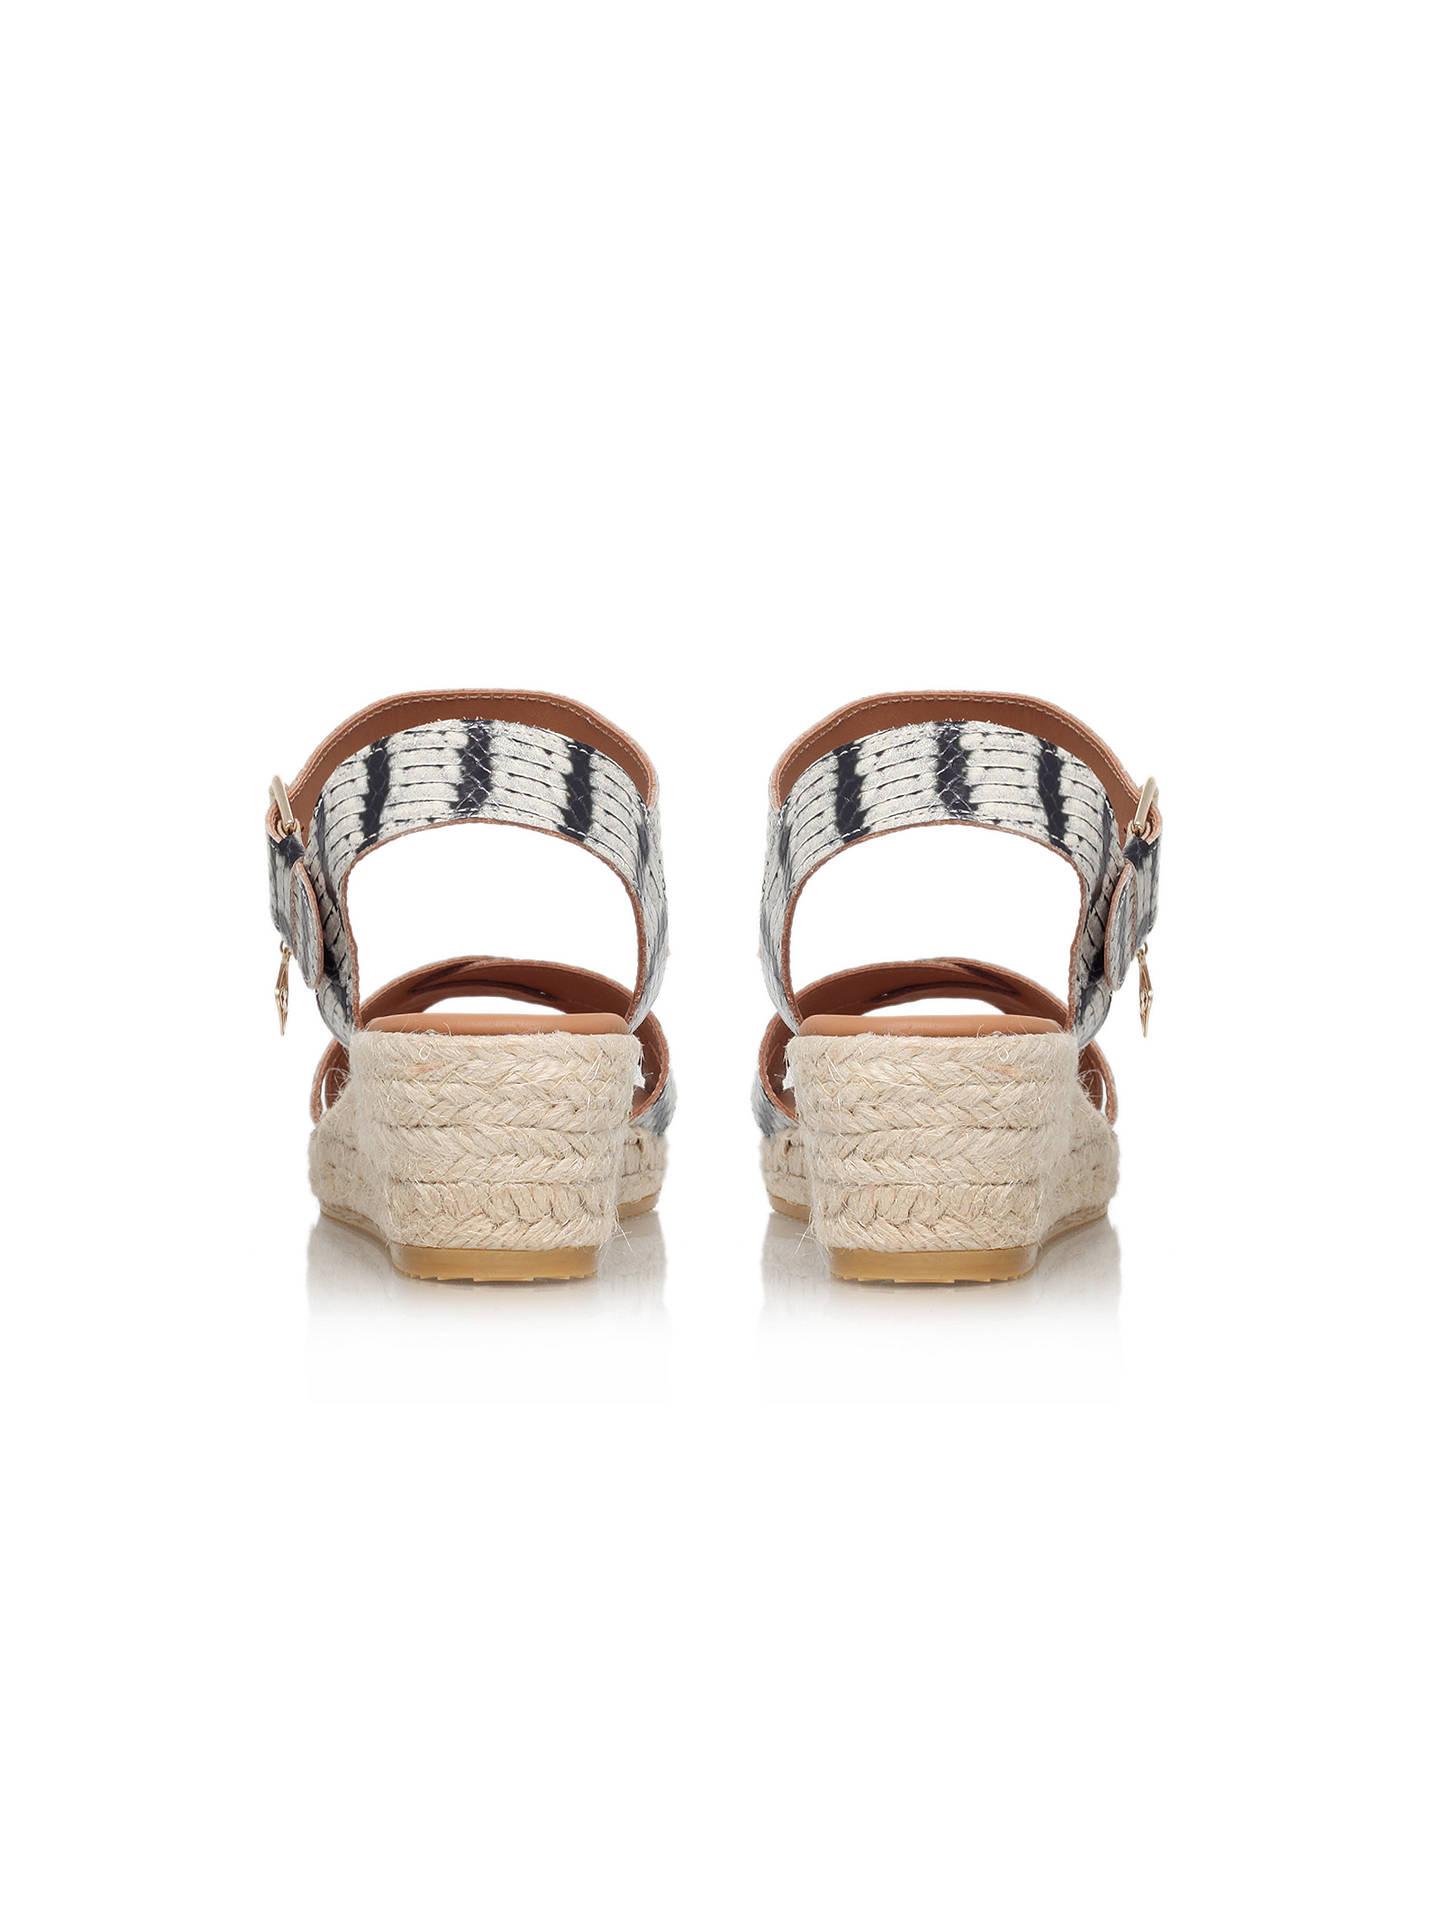 d99b9e5503c Kurt Geiger London Libby Leather Sandals at John Lewis   Partners